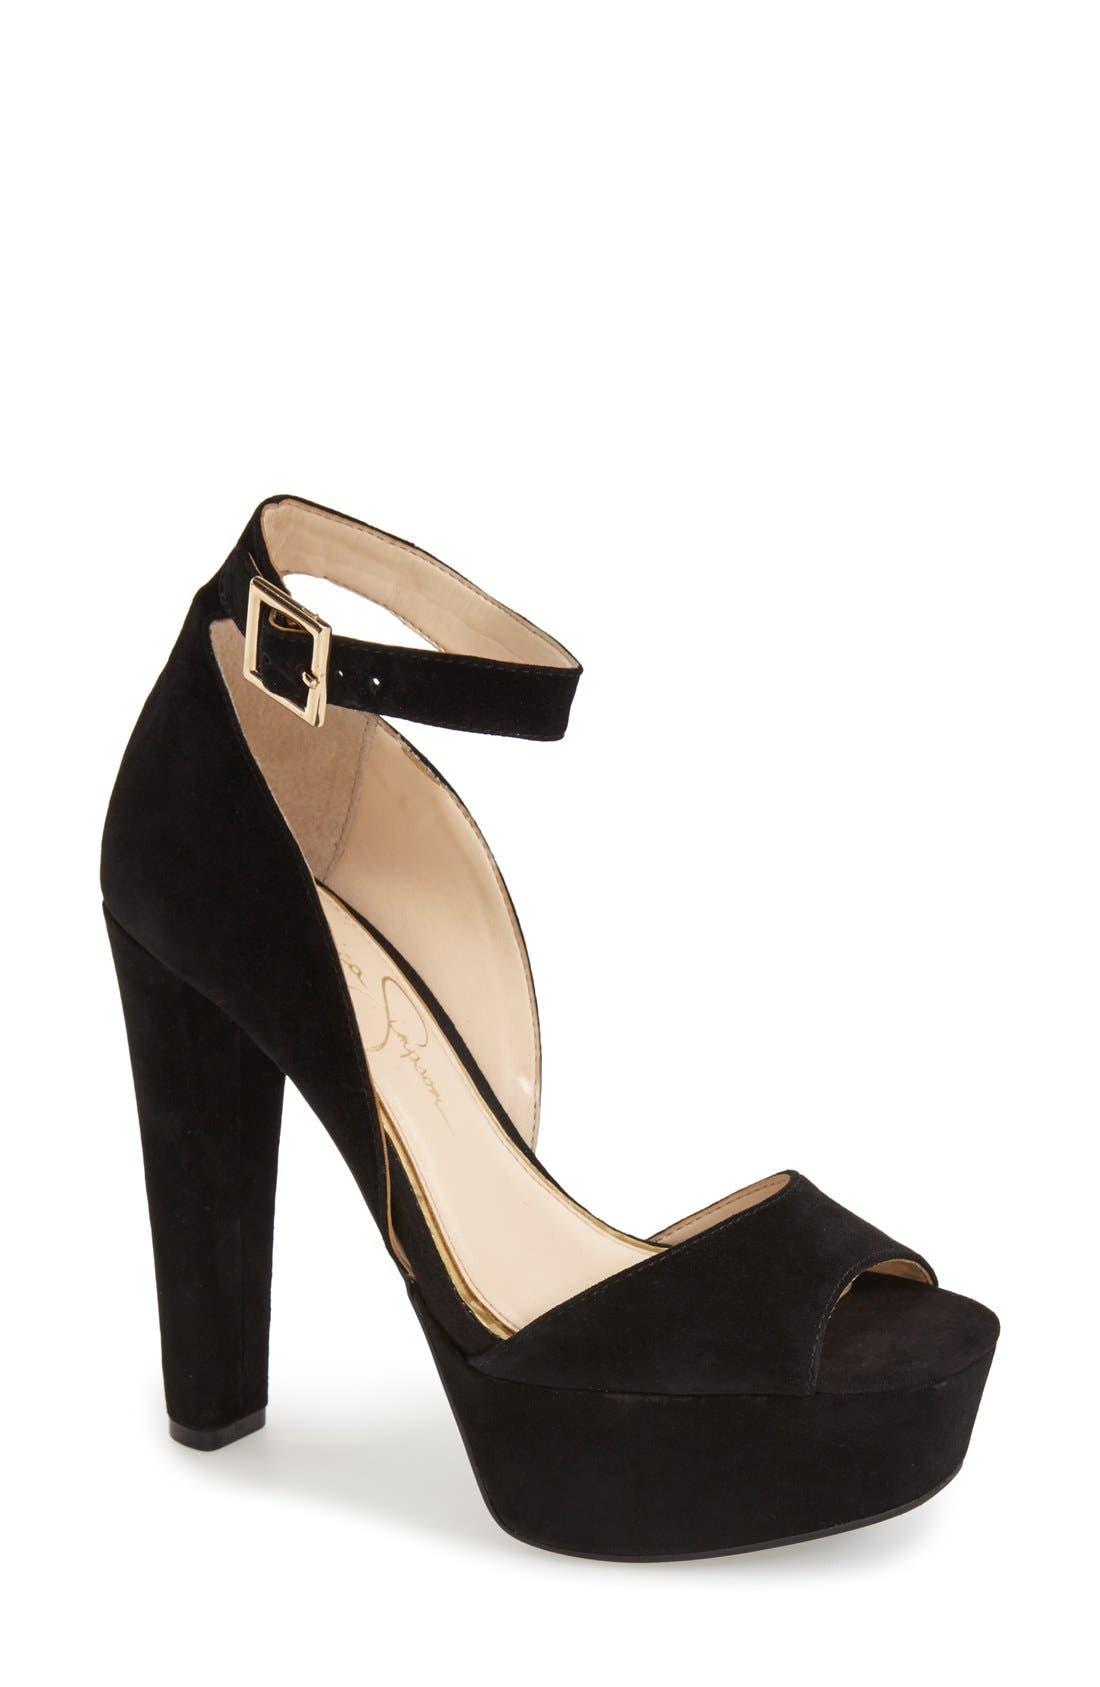 Main Image - Jessica Simpson 'Athens' Ankle Strap Platform Sandal (Women)